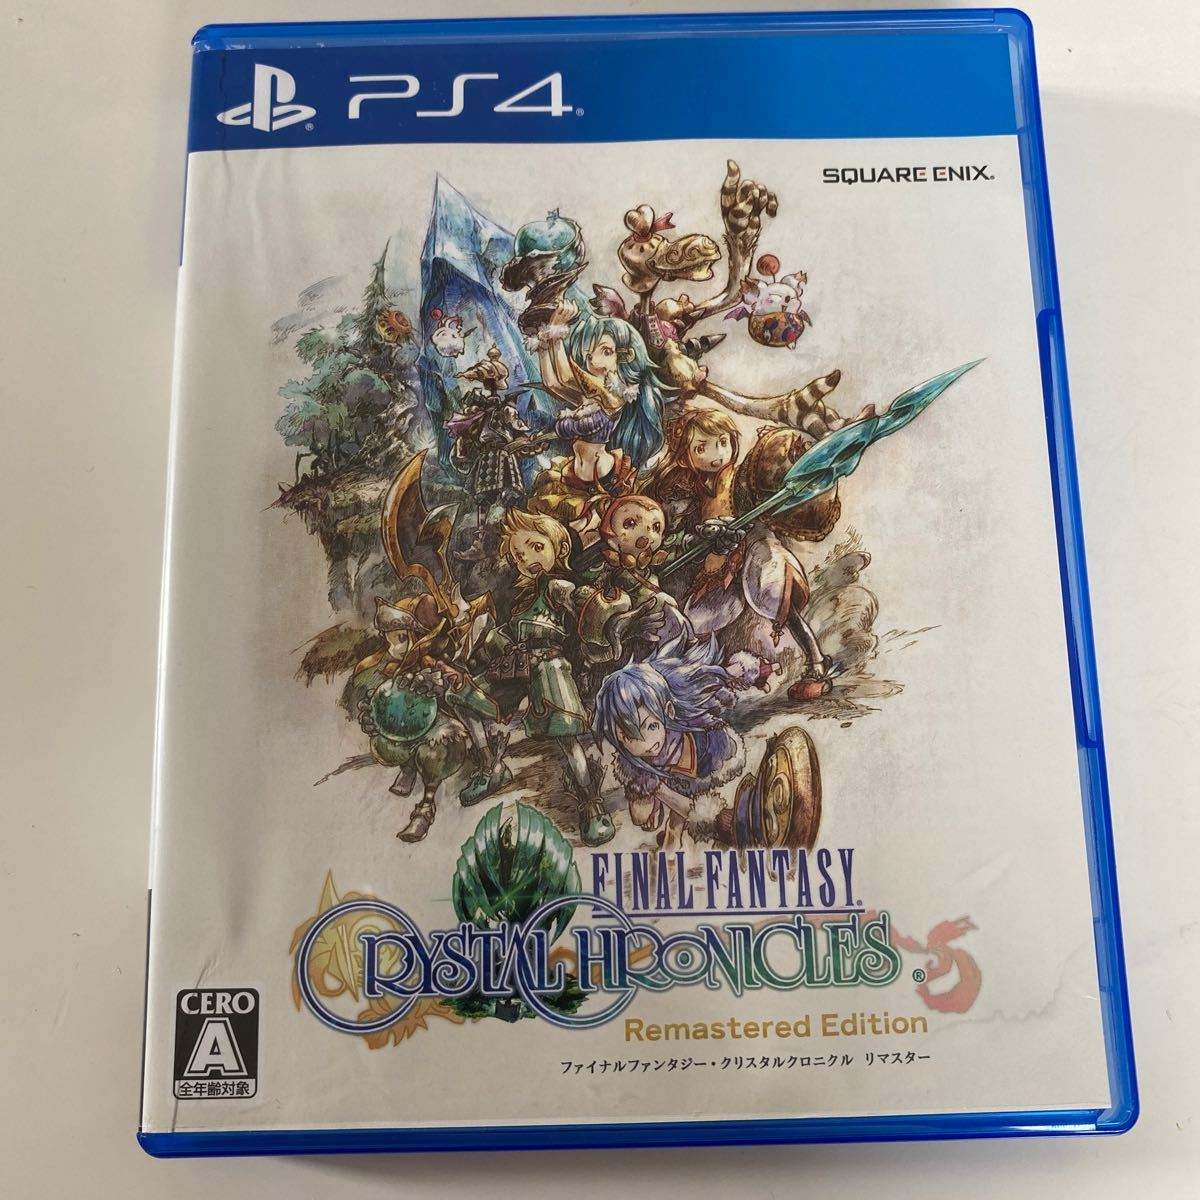 【PS4】 ファイナルファンタジー・クリスタルクロニクル リマスター